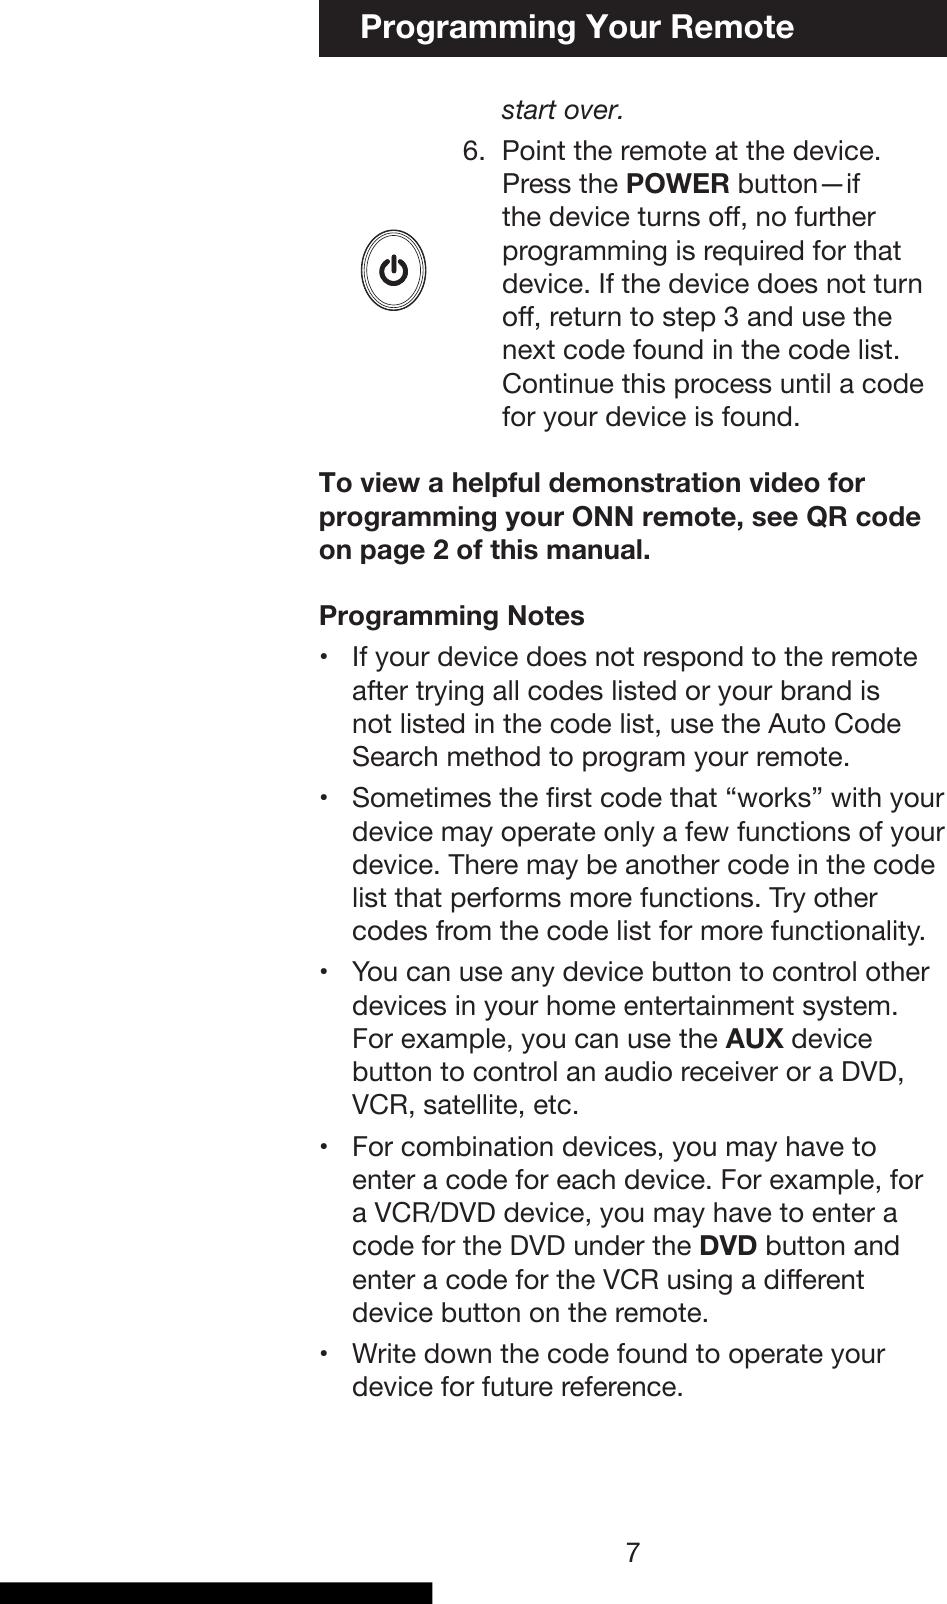 Onn Onb13Av004 Manual 820290 ManualsLib Makes It Easy To Find